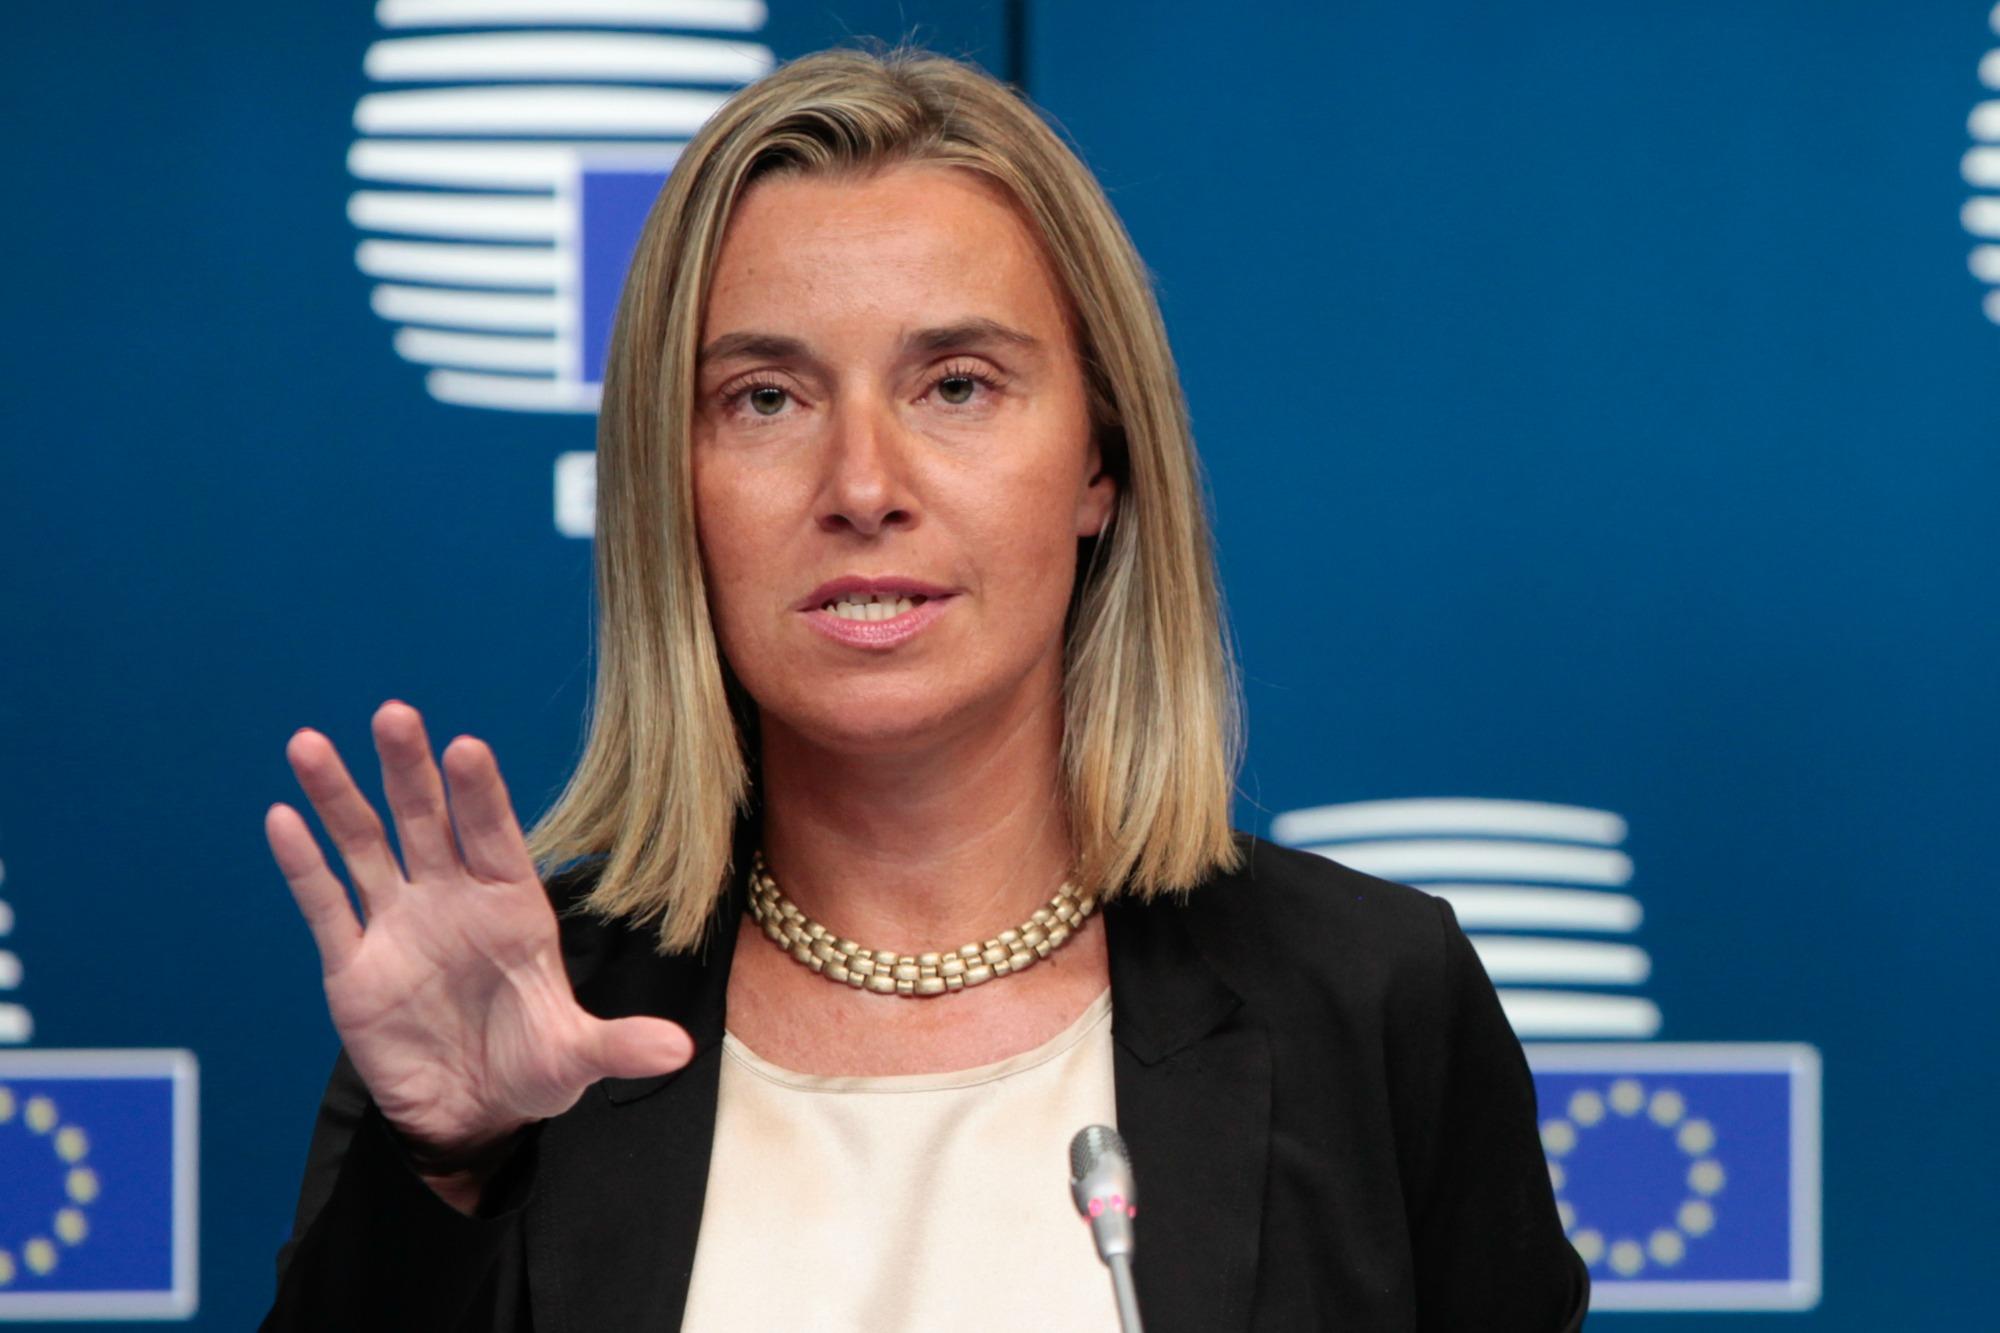 Mogherini: Η συμφωνία μεταξύ Πρίστινας και Βελιγραδίου θα πρέπει να έχει την υποστήριξη το ΟΗΕ